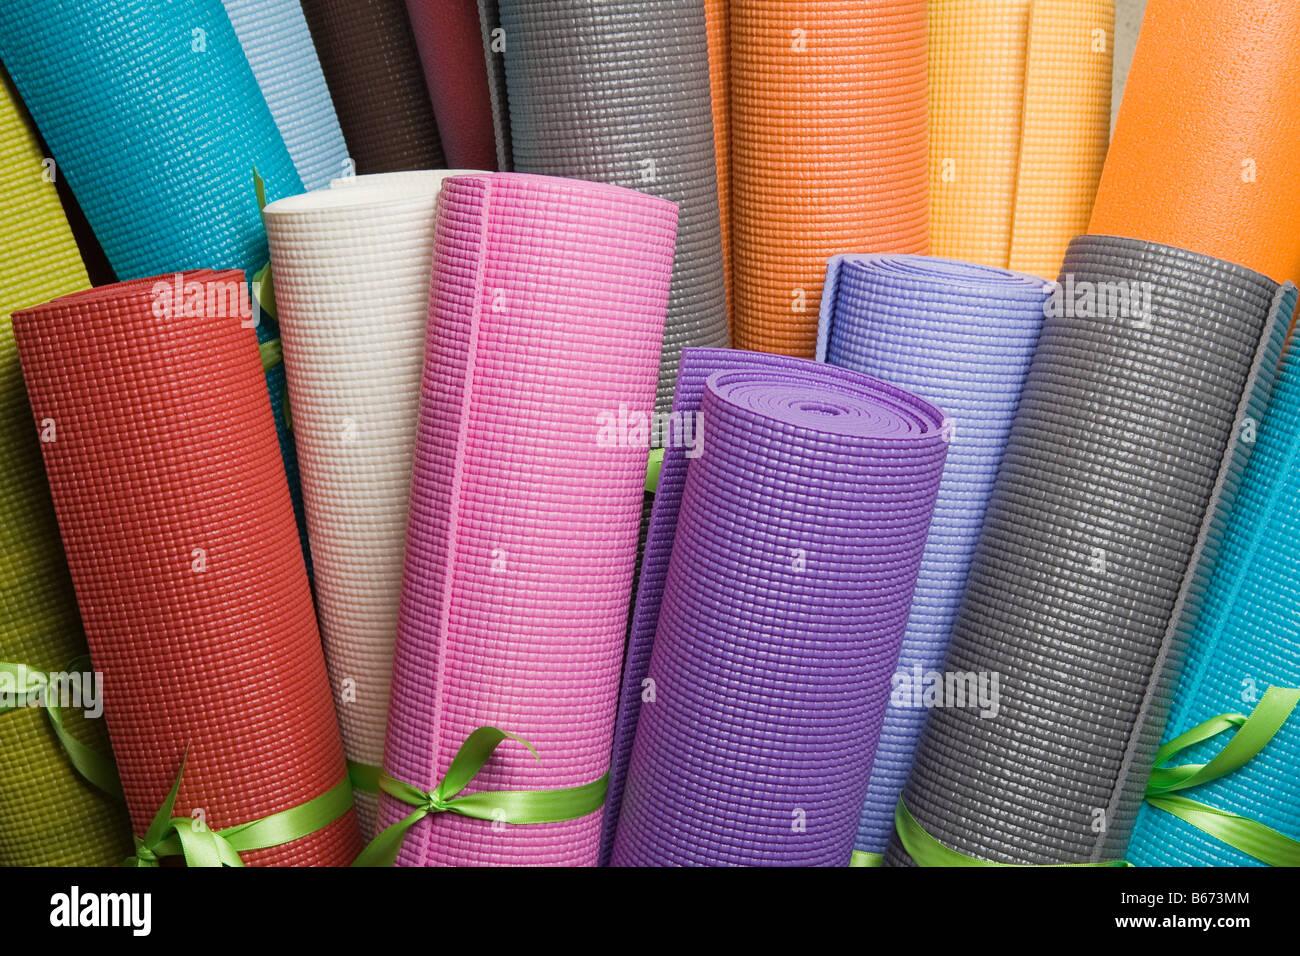 Yoga mats - Stock Image